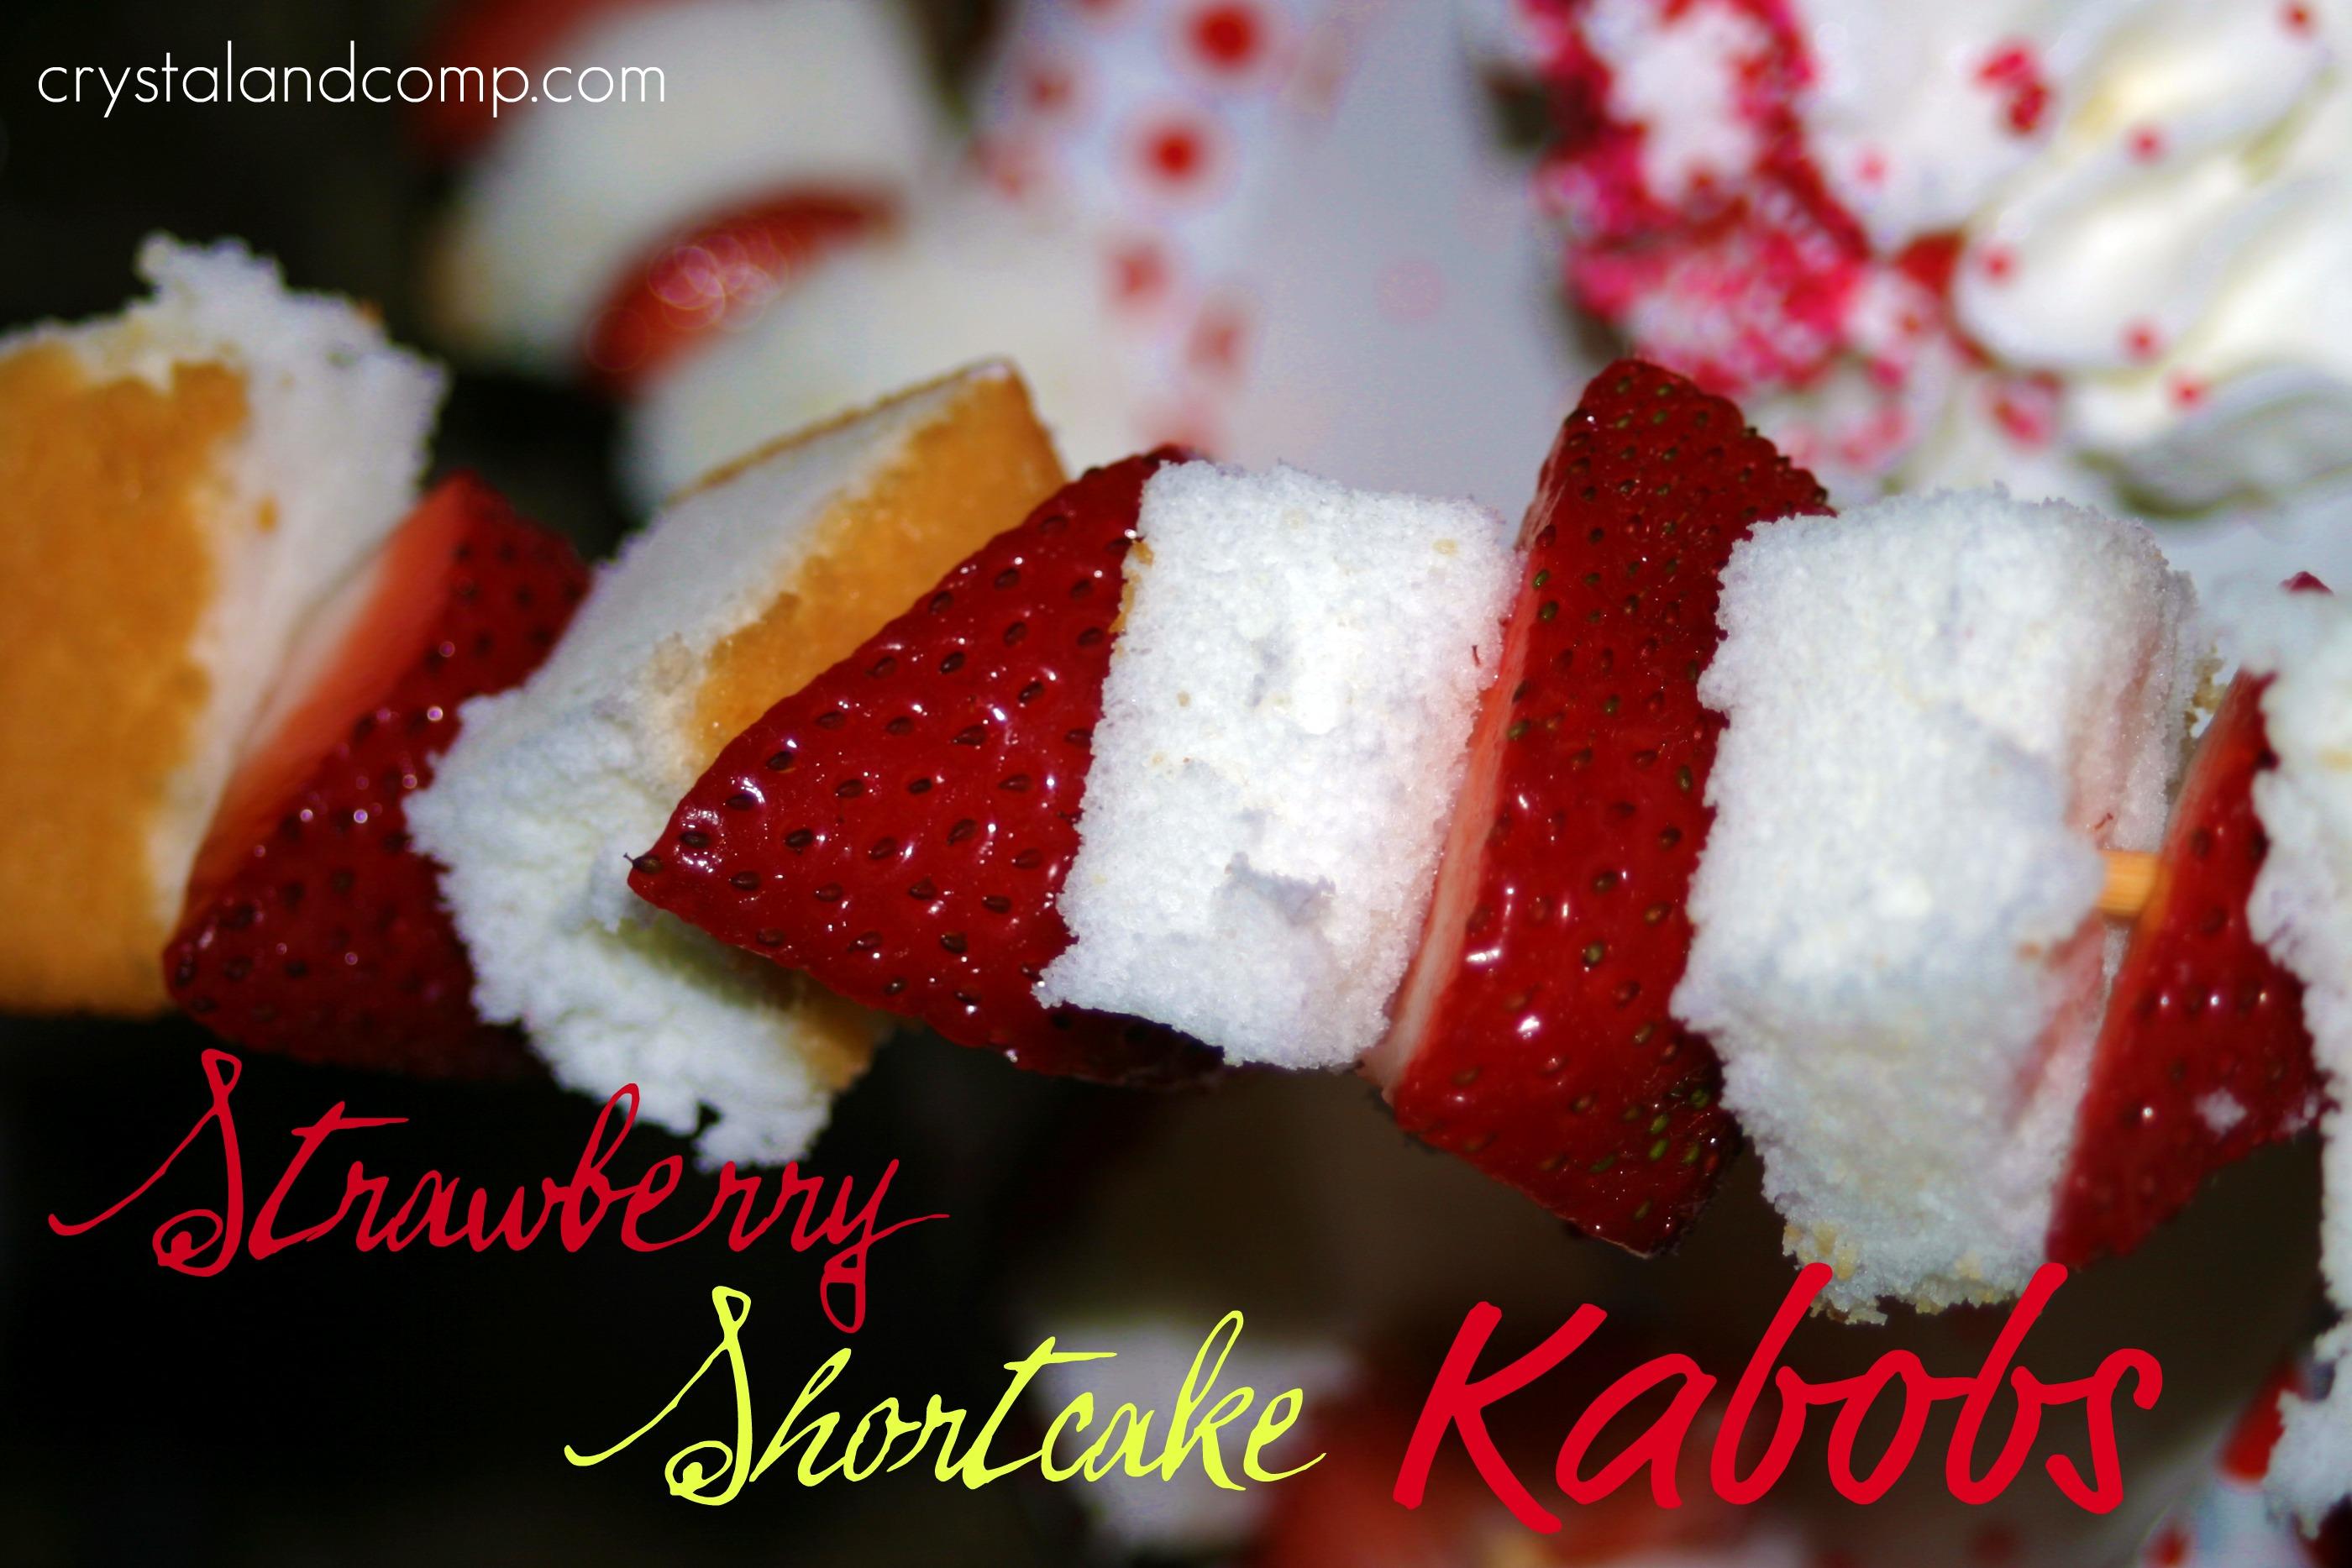 Strawberry Shortcake Baby Shower Supplies Part - 35: This ...